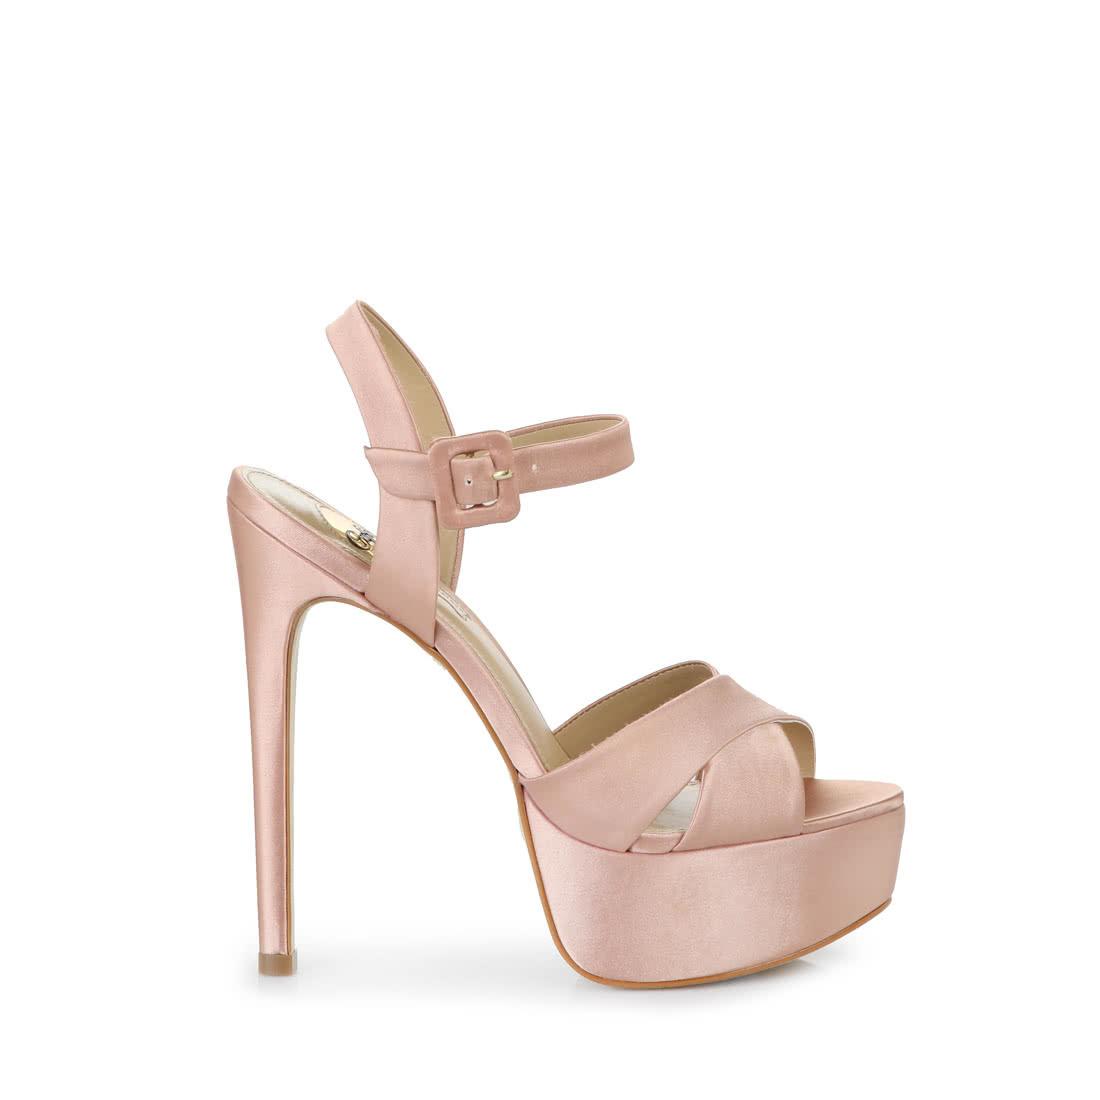 470cf57b76f Buffalo high-heeled platform sandals in dusty pink buy online in ...